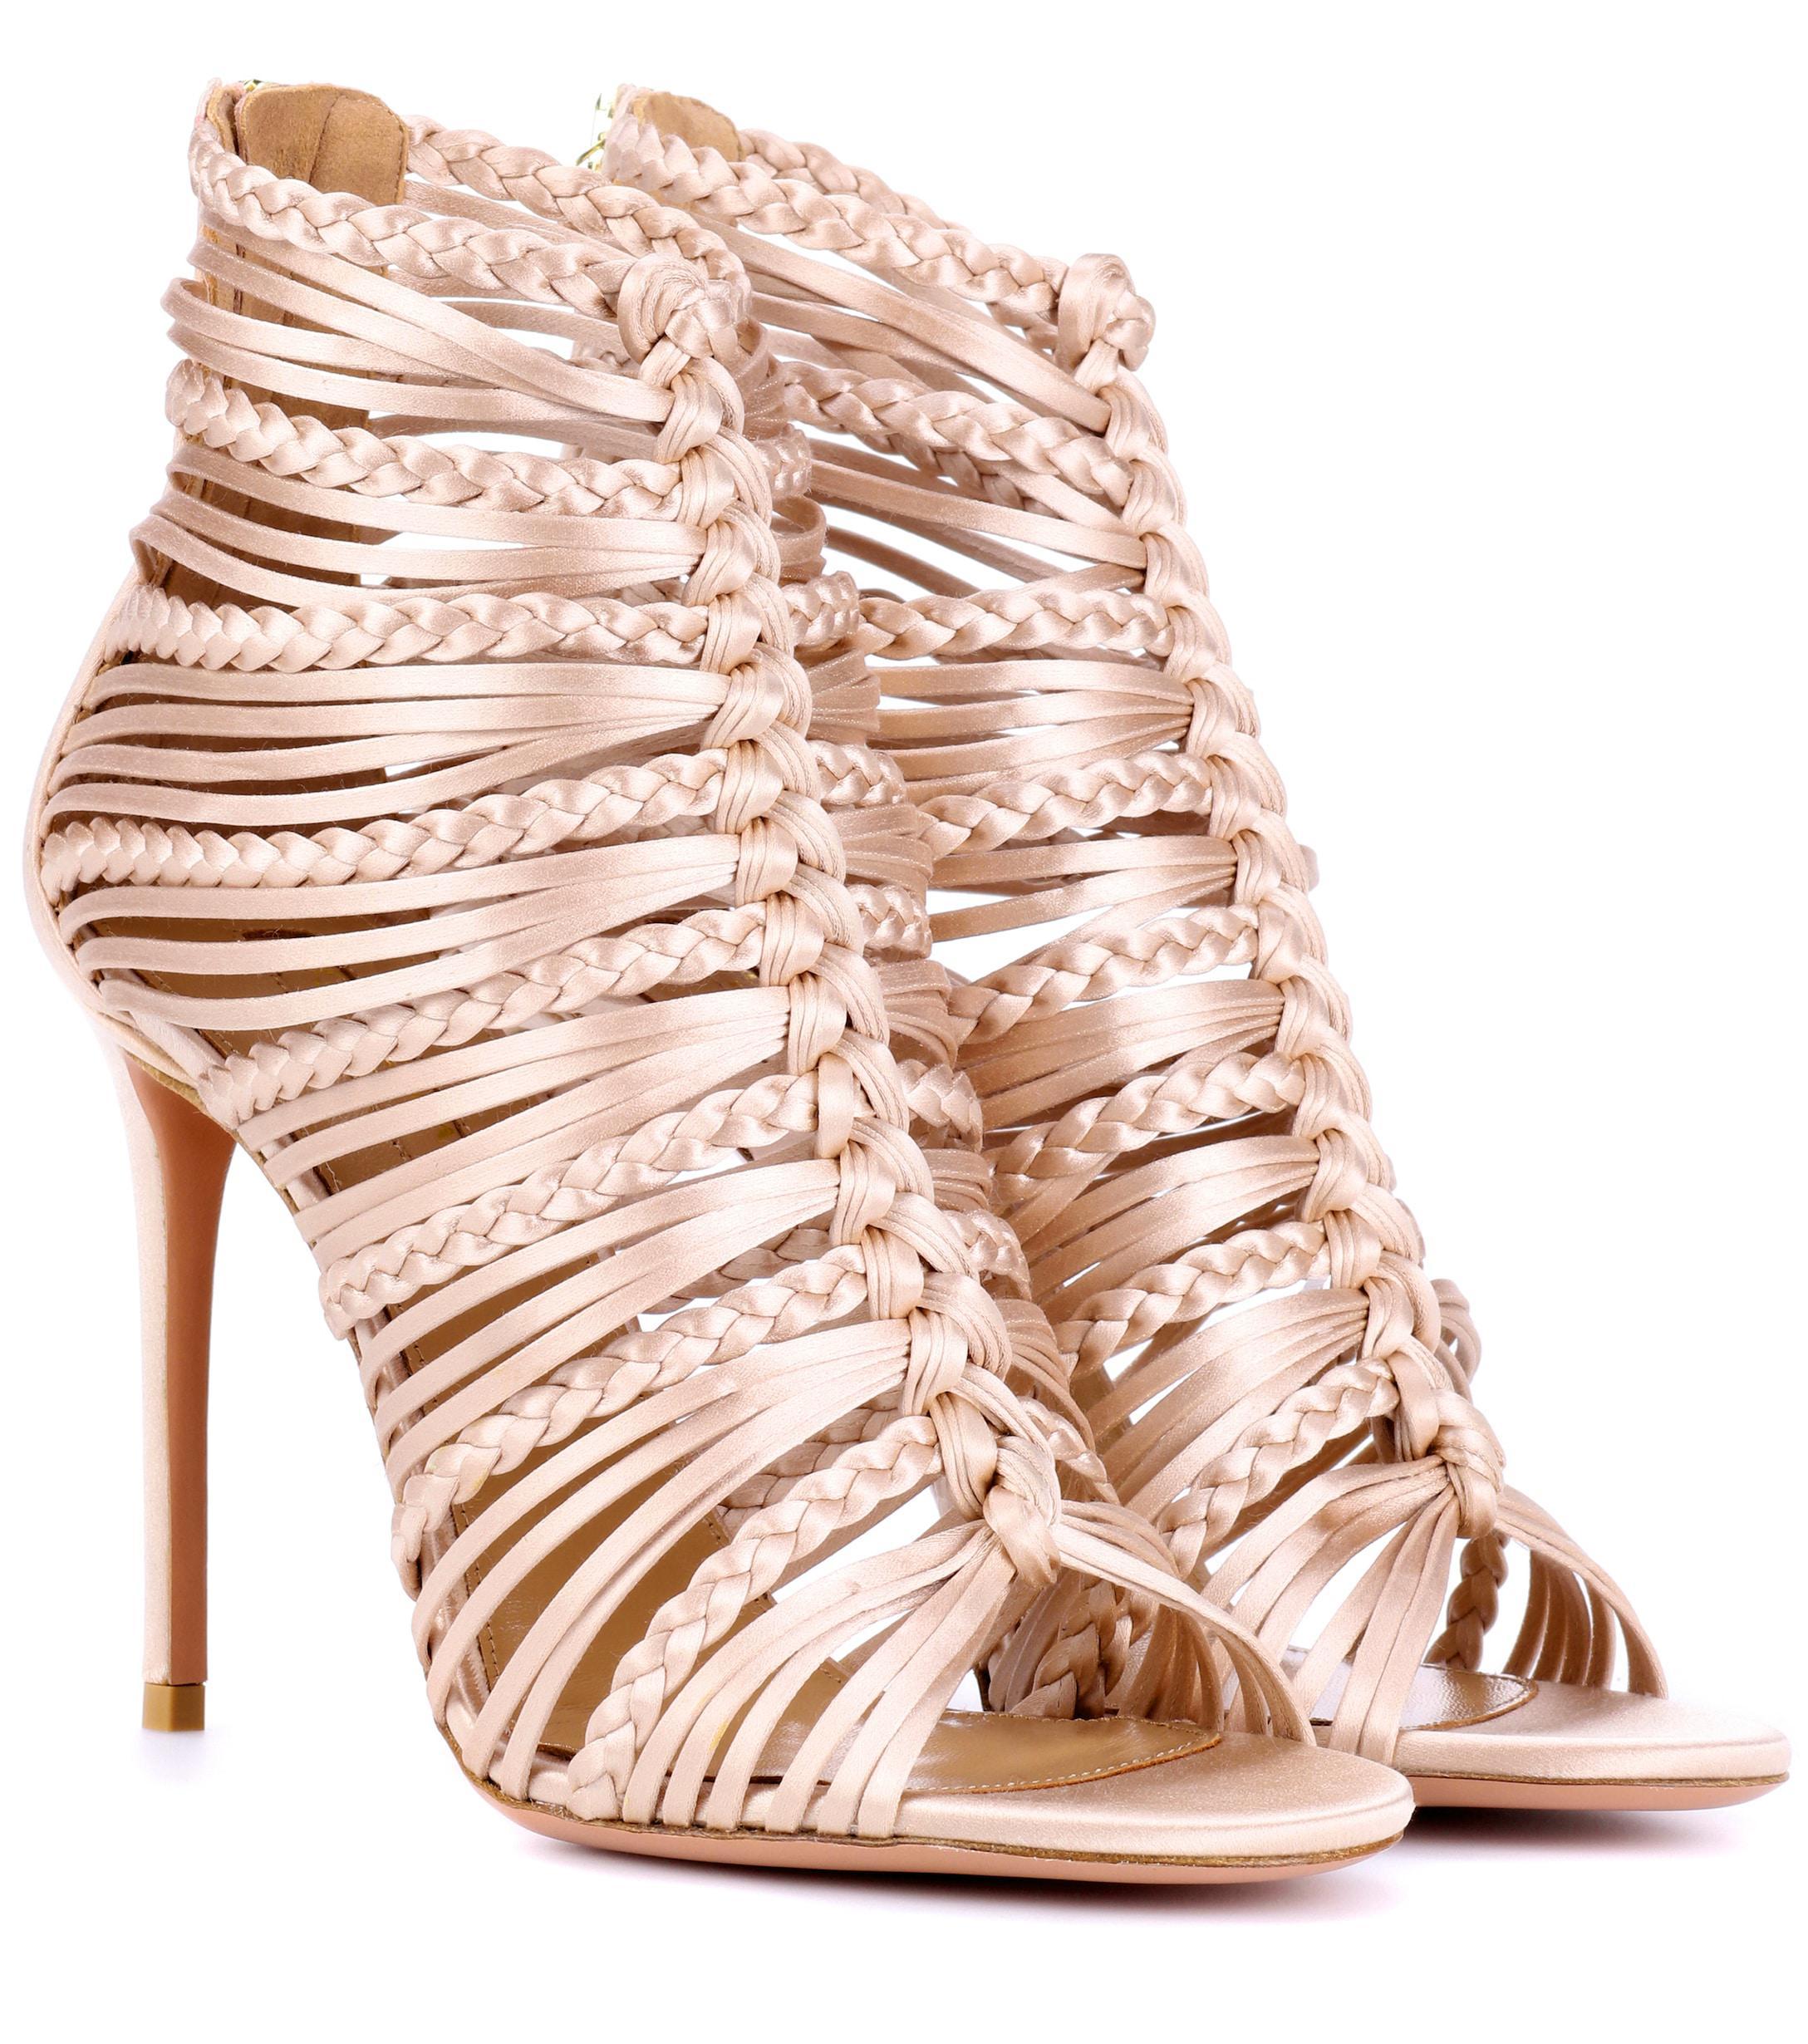 4e26eb60ce9 Lyst - Aquazzura Goddess 105 Satin Sandals in Pink